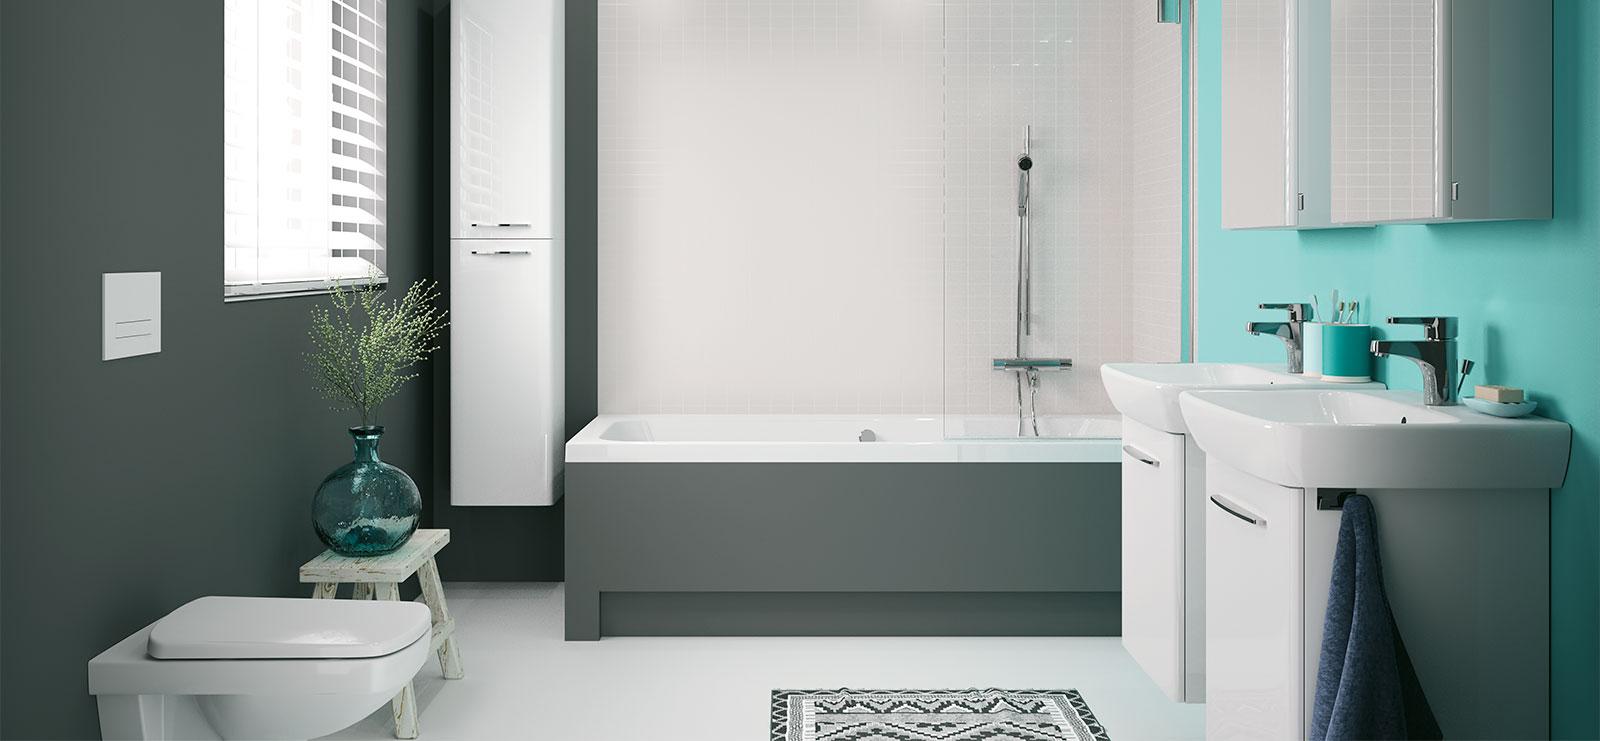 Sphinx 310 – Schuurbiers - Specialist in keukens en badkamers